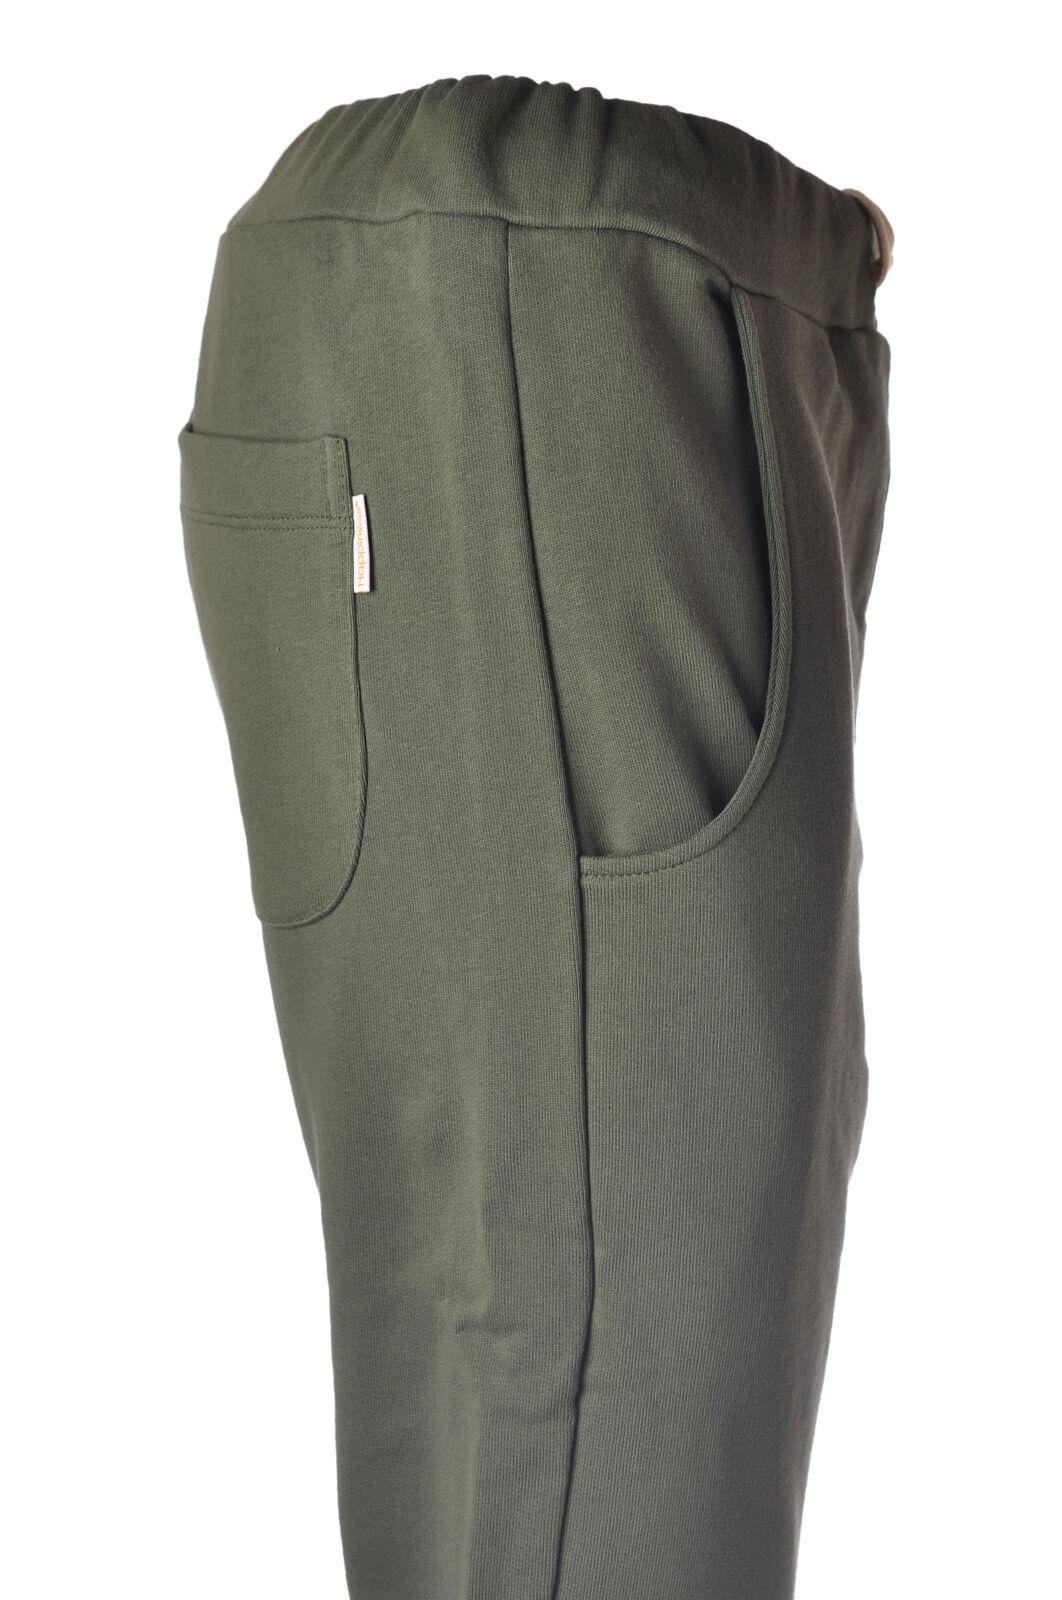 Happiness - Pants, Trousers, sweatshirt - Man - Green - 4901615B181537